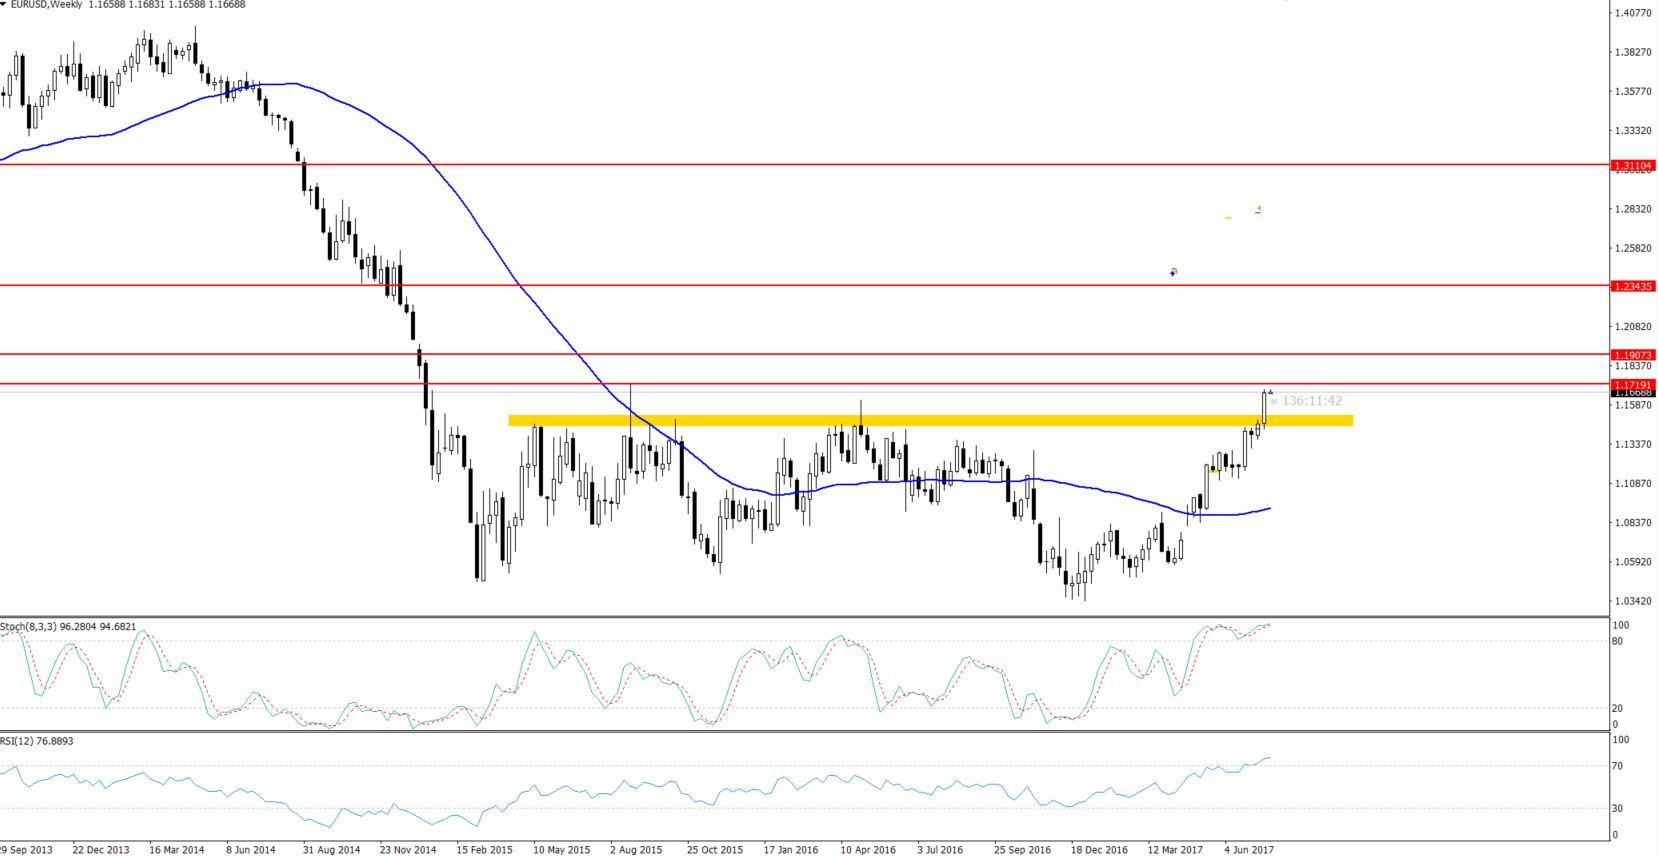 EURUSD - Weehly Chart - Bullish Breakout